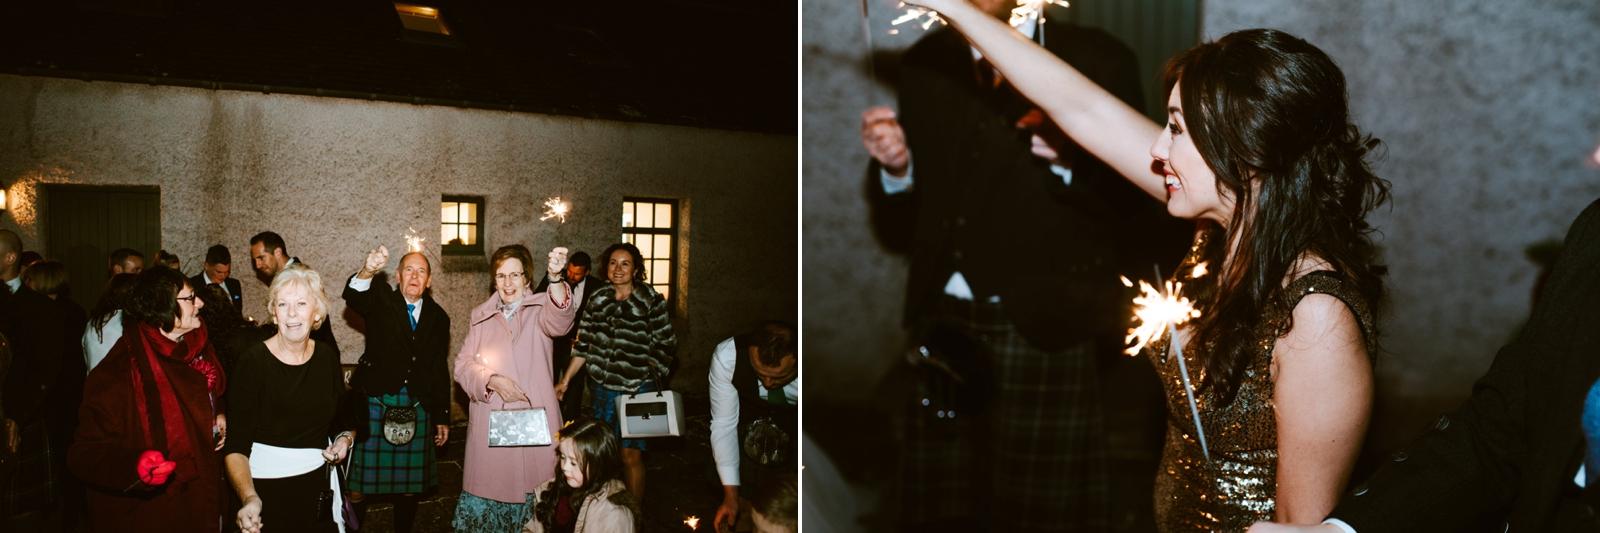 alternative-wedding-photography-scotland-katie-stephen-aikwood-tower-472.jpg